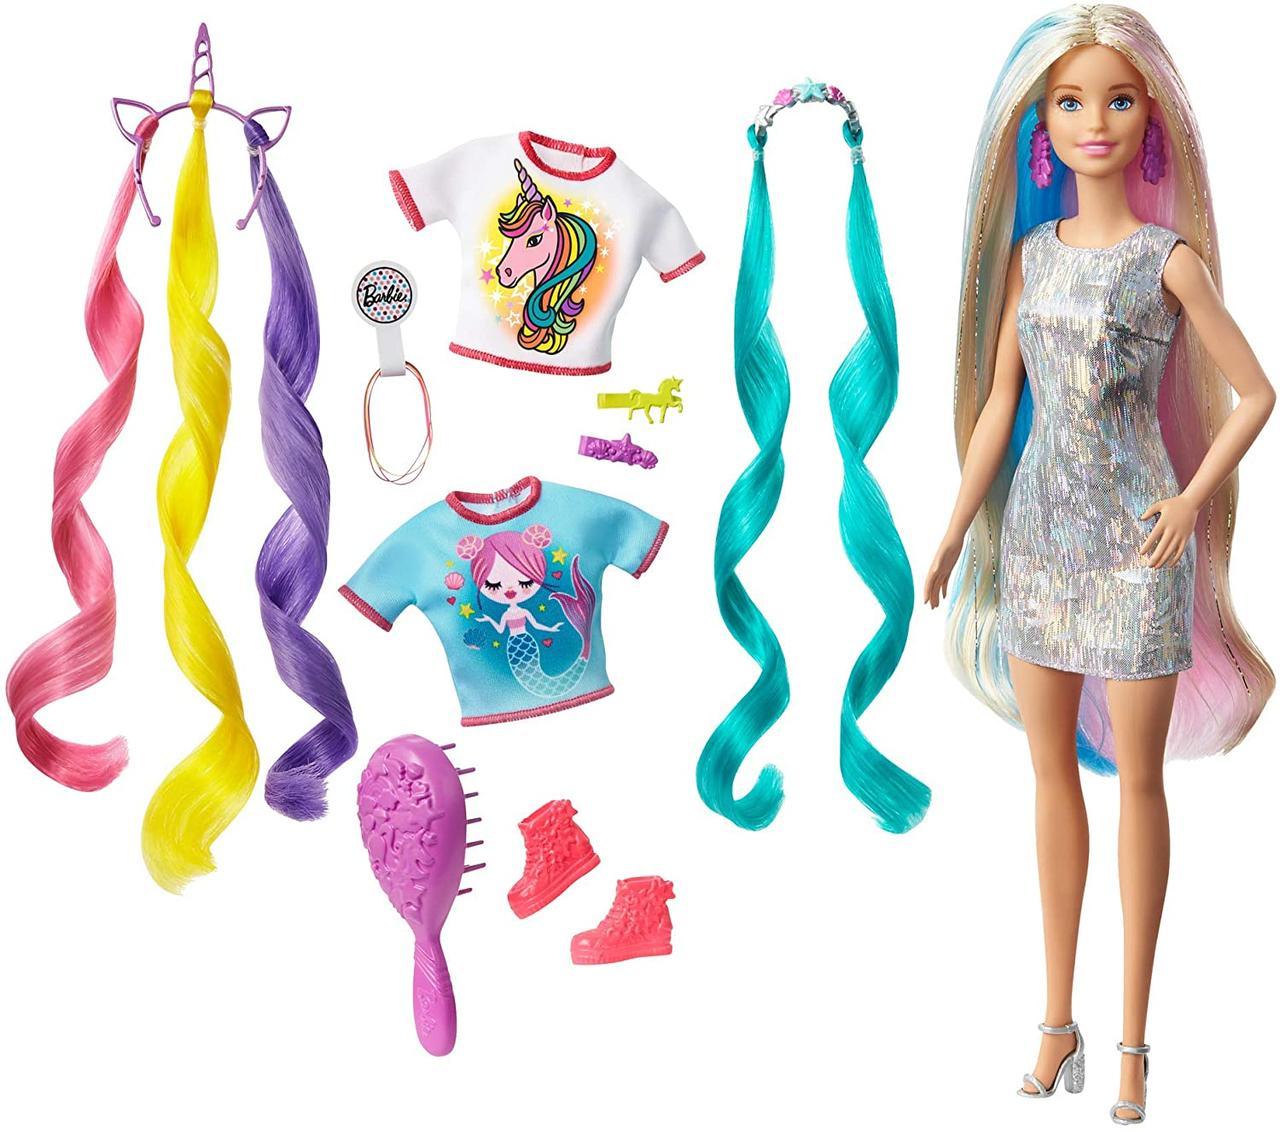 Кукла Барби Фантастические волосы Оригинал Barbie Fantasy Hair Doll, Blonde (GHN04)